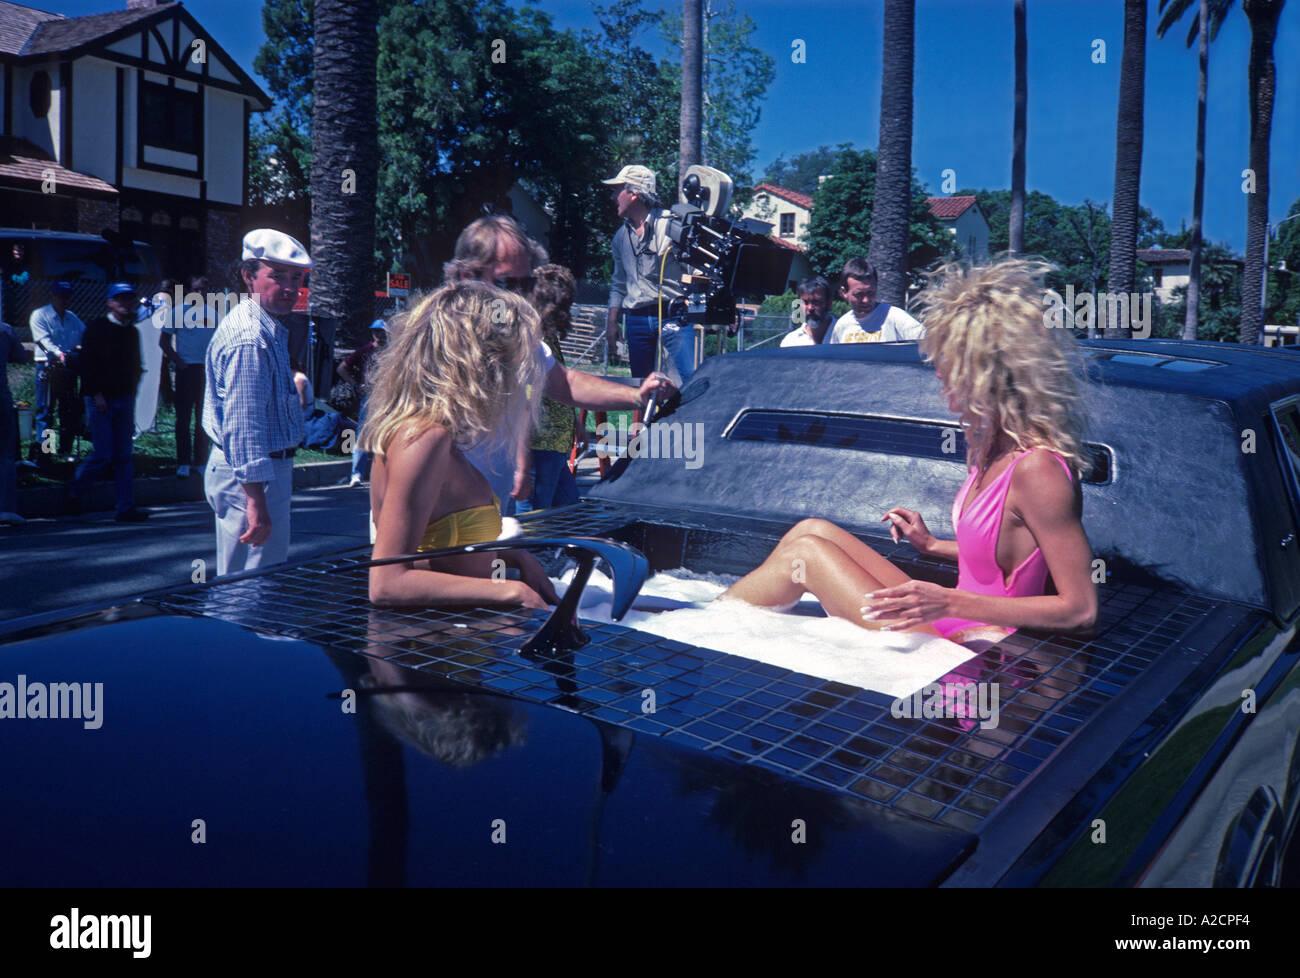 Limousine Con Vasca Da Bagno.Condivisa Limousine Con Jacuzzi Vasca Calda Beverly Hills Set